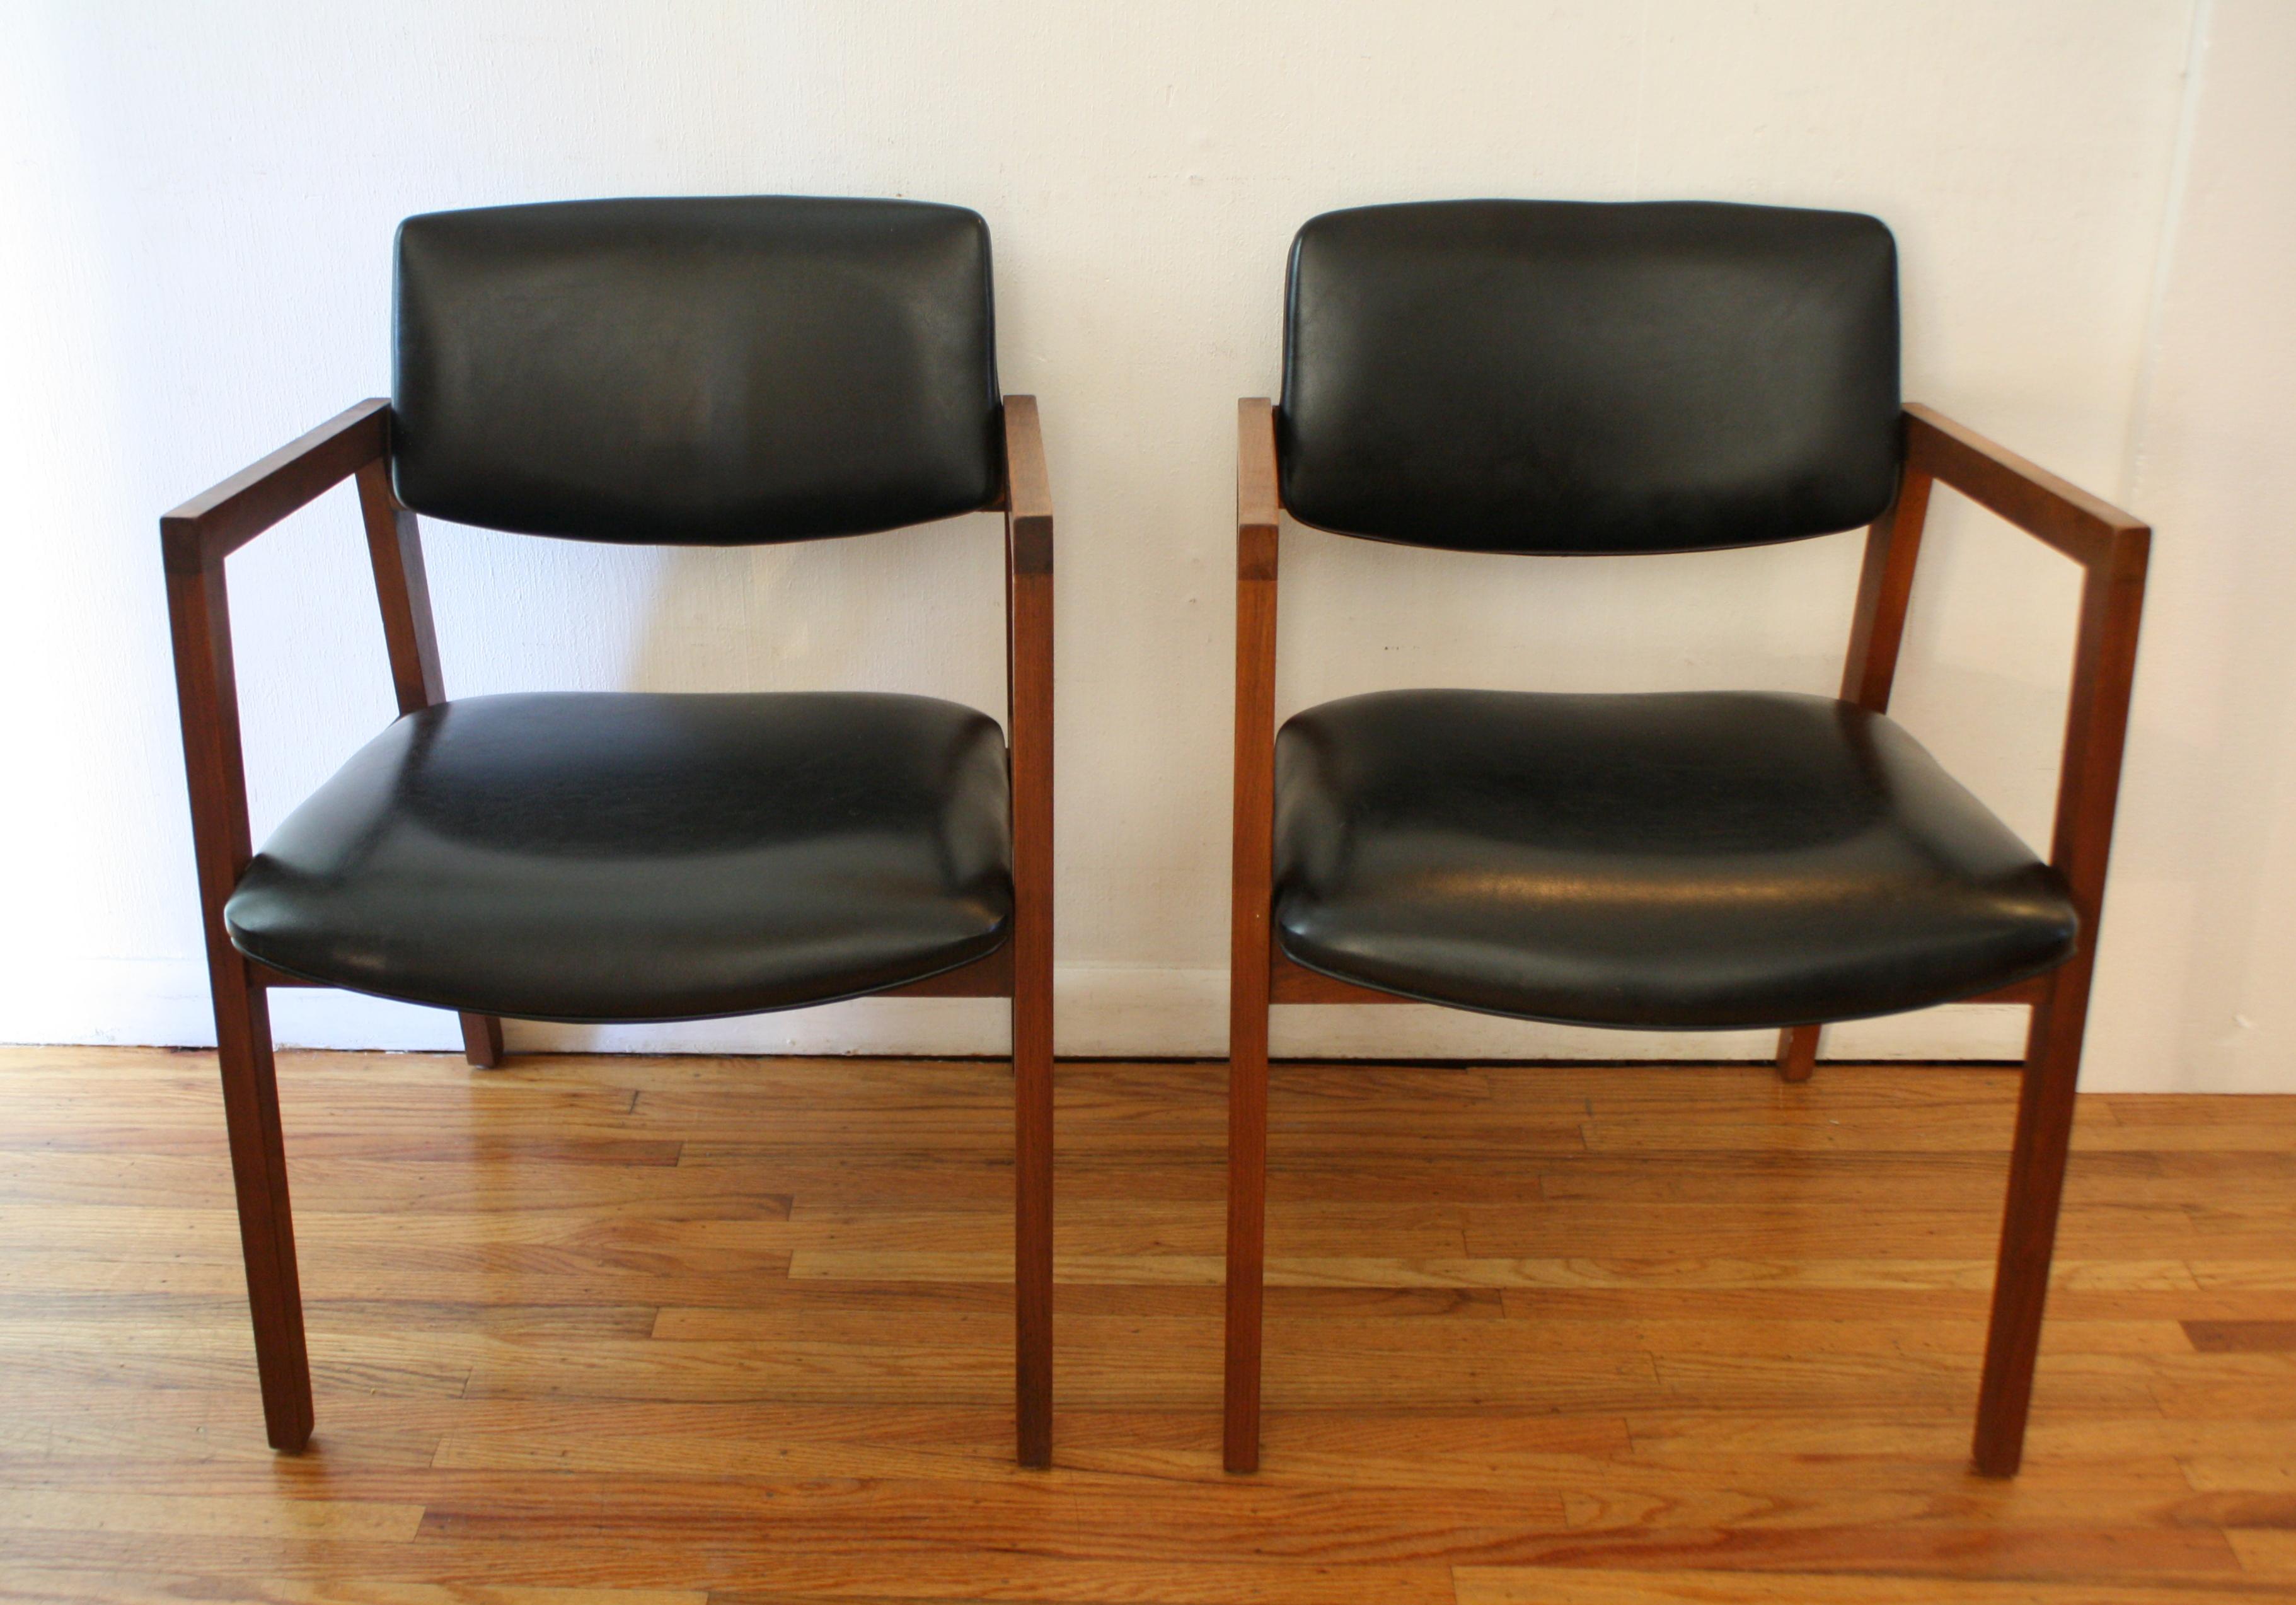 mcm pair of black naugahyde chairs 1